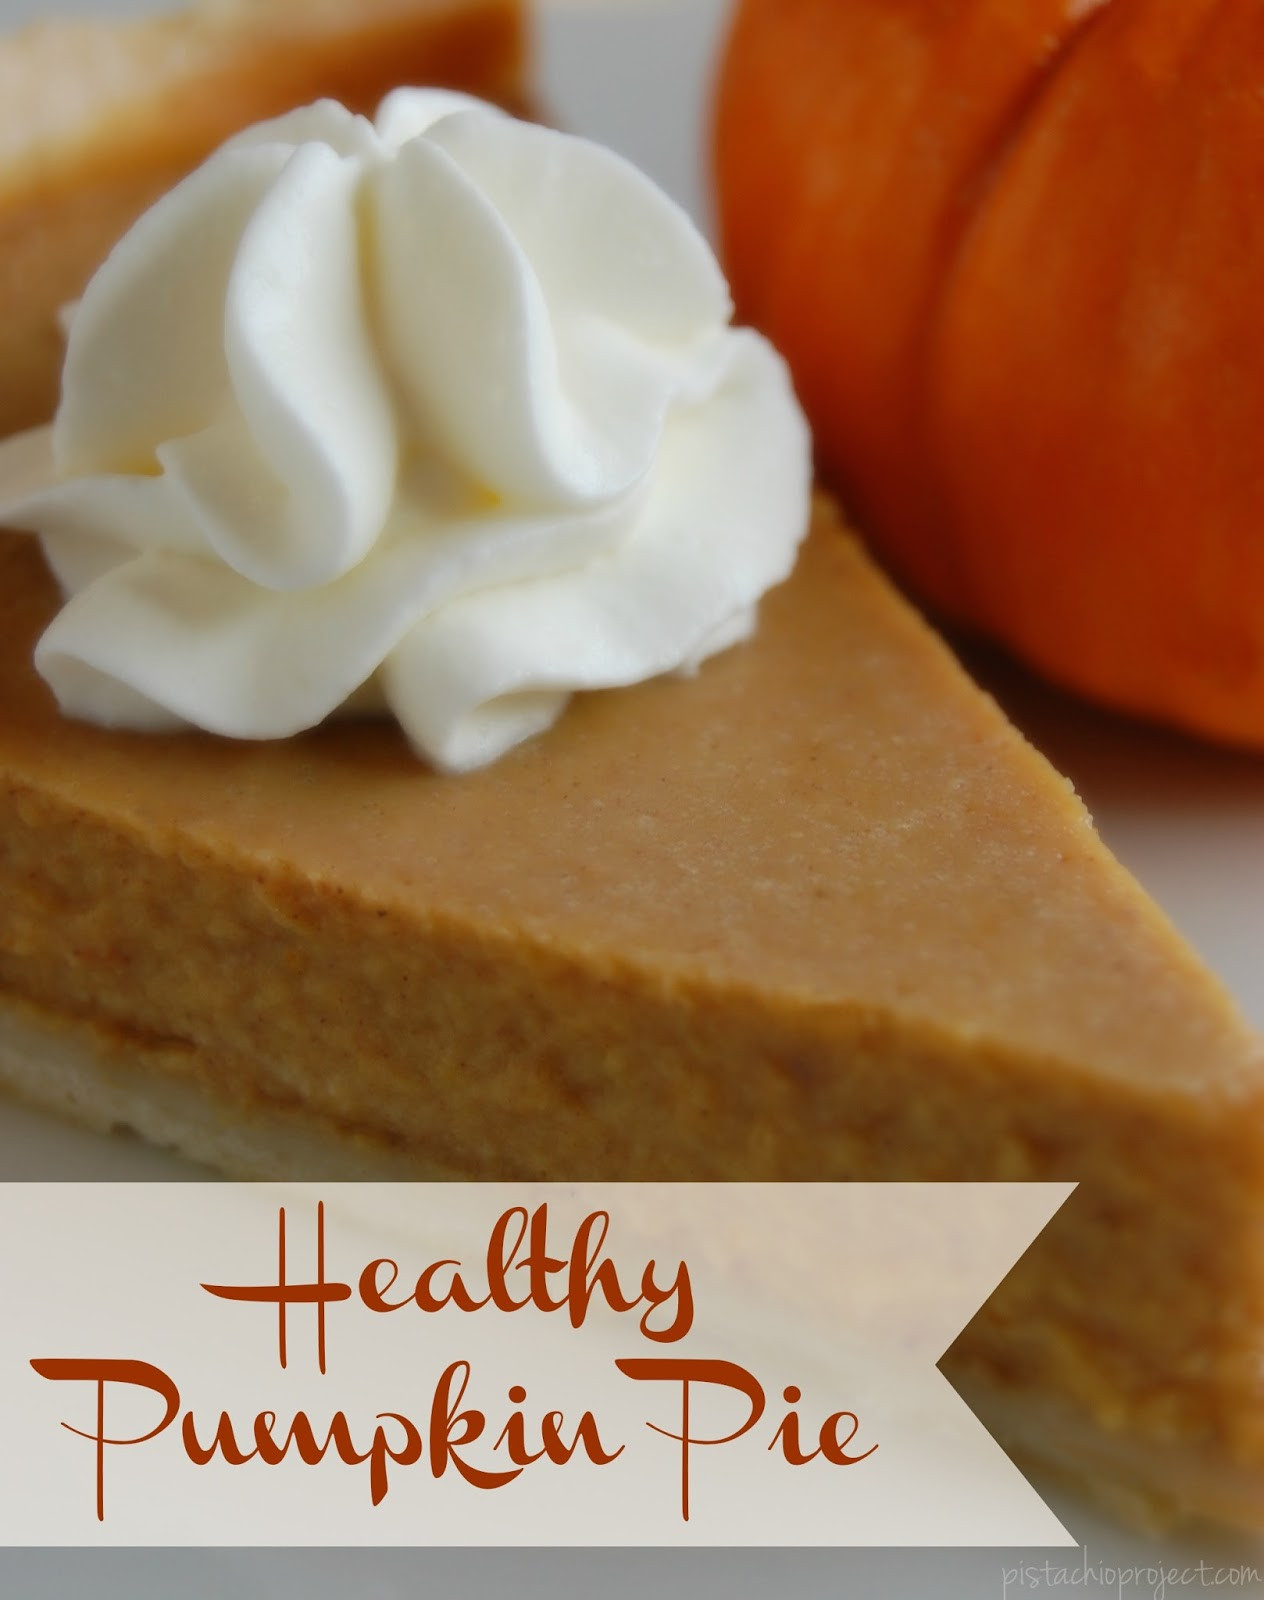 Healthy Pumpkin Pie Filling  Healthy Pumpkin Pie The Pistachio Project